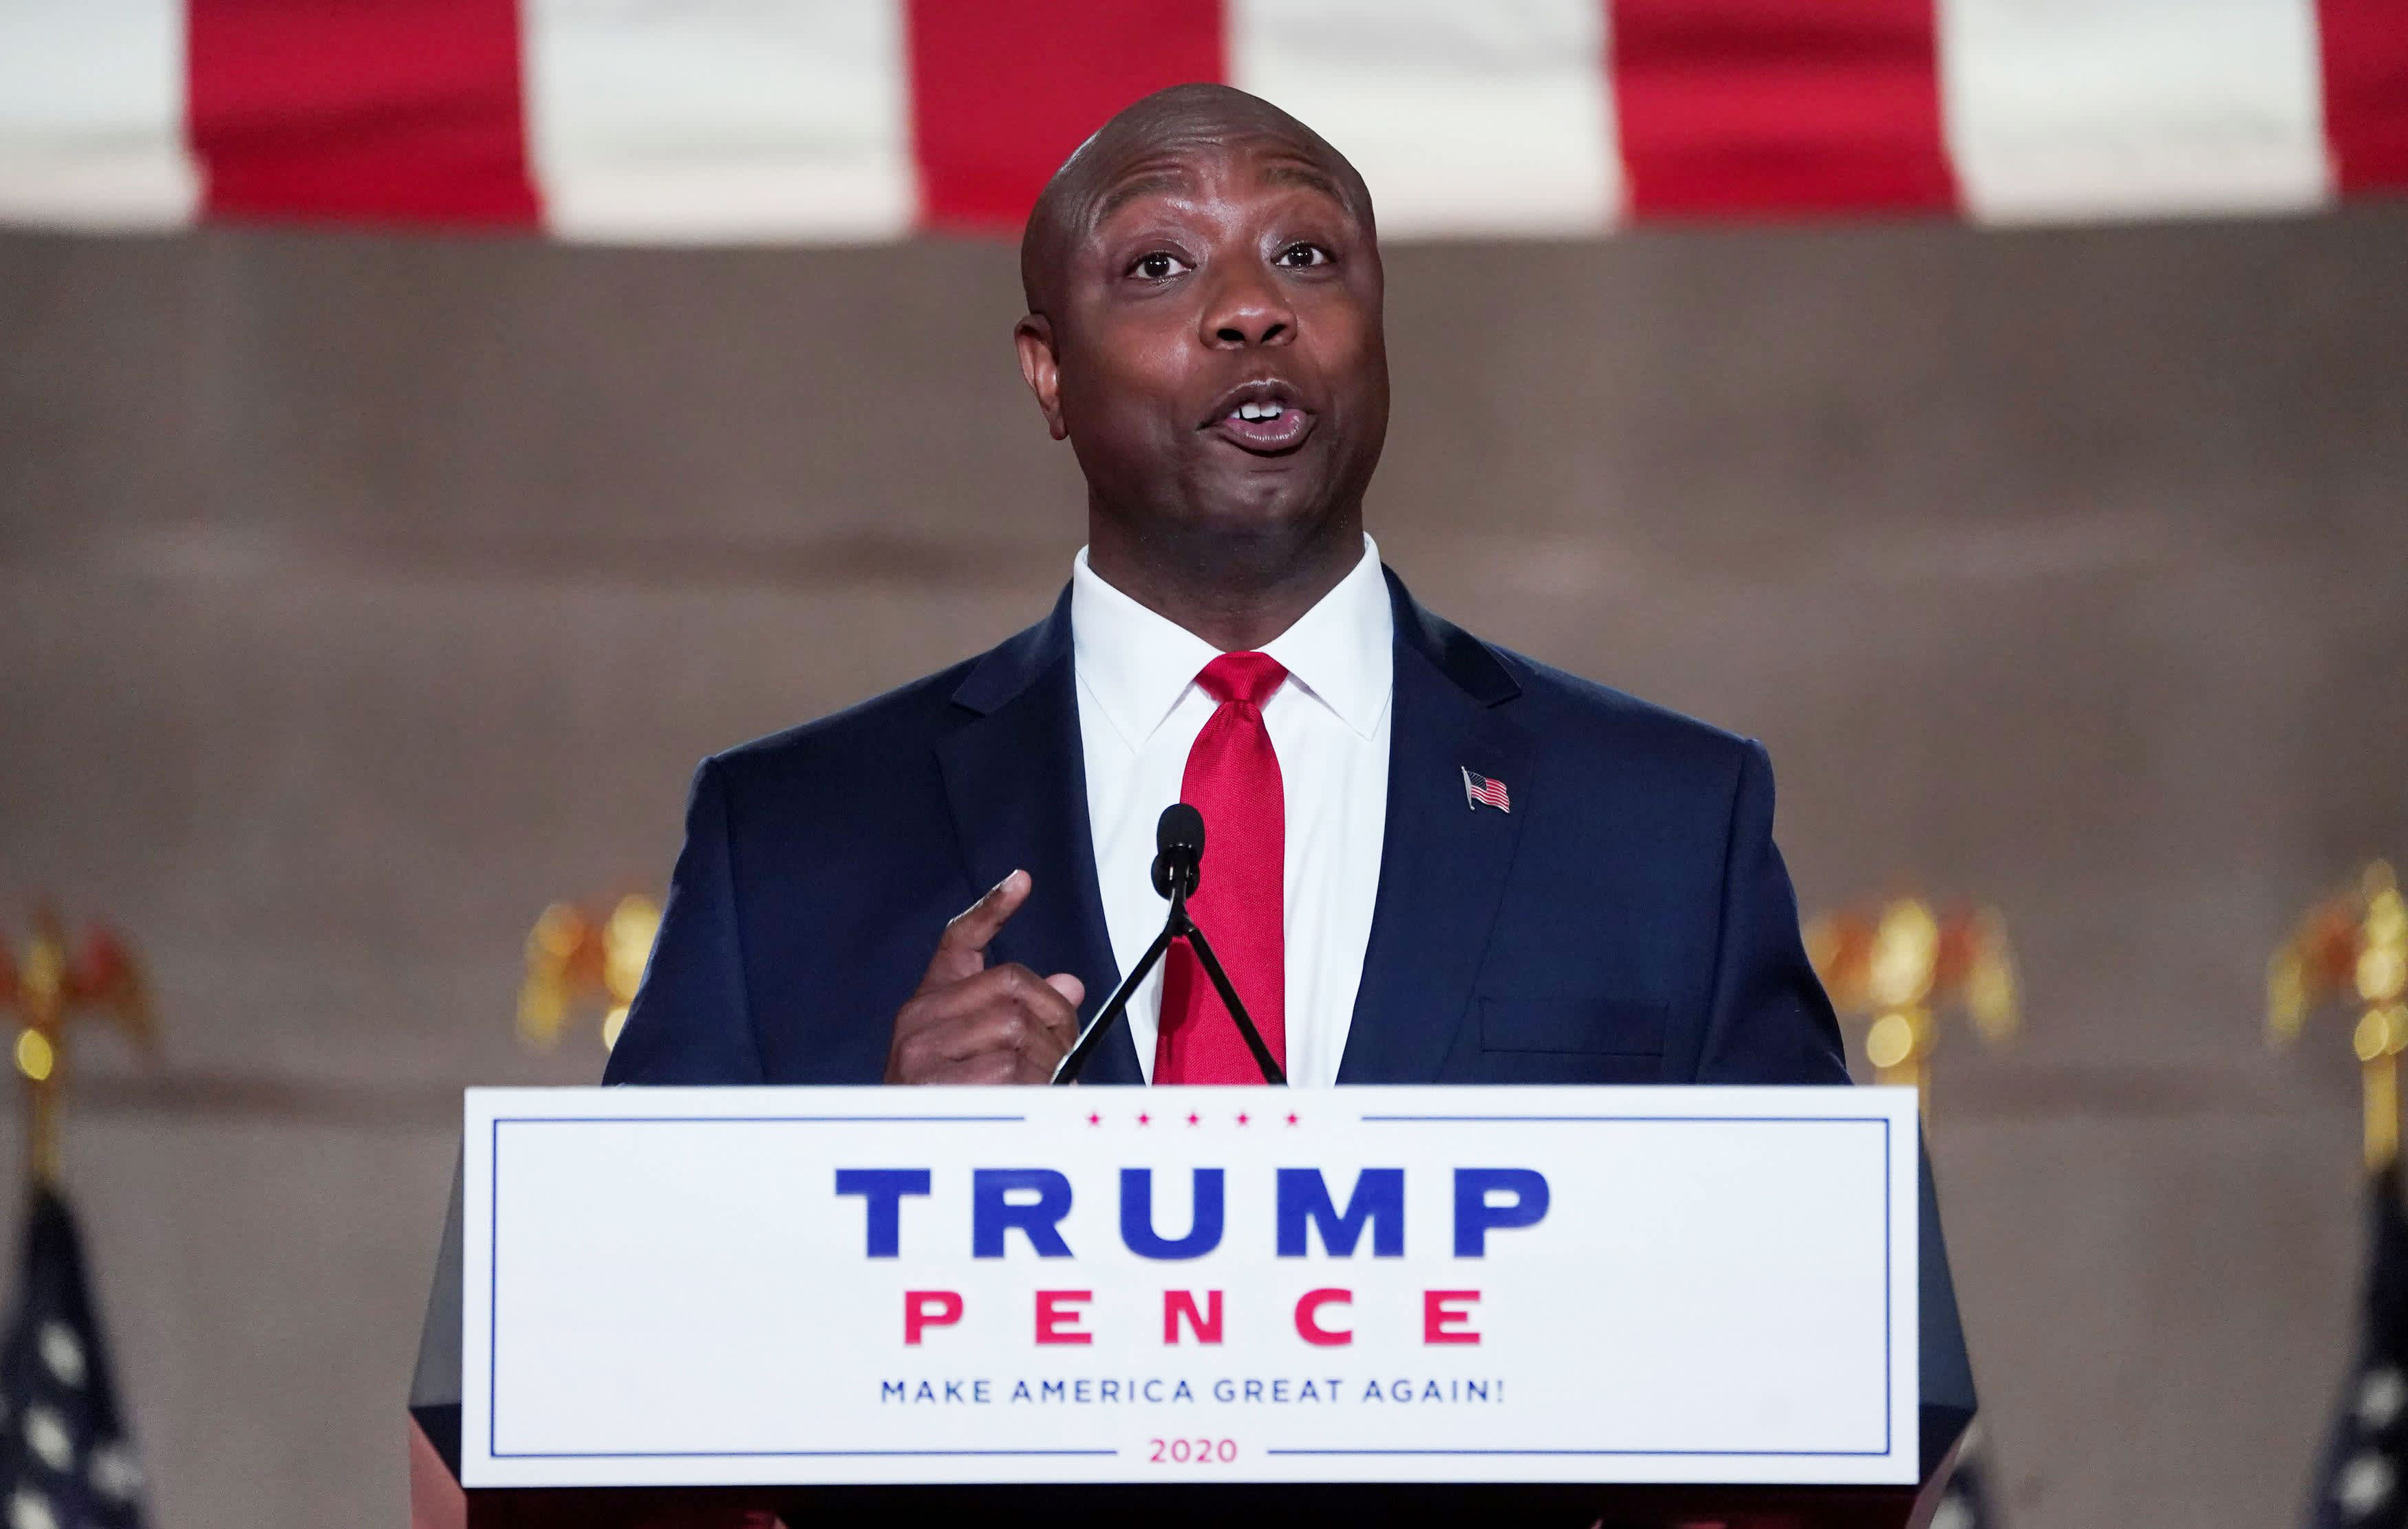 Trump should correct his statements on White supremacists GOP Sen. Tim Scott says – CNBC